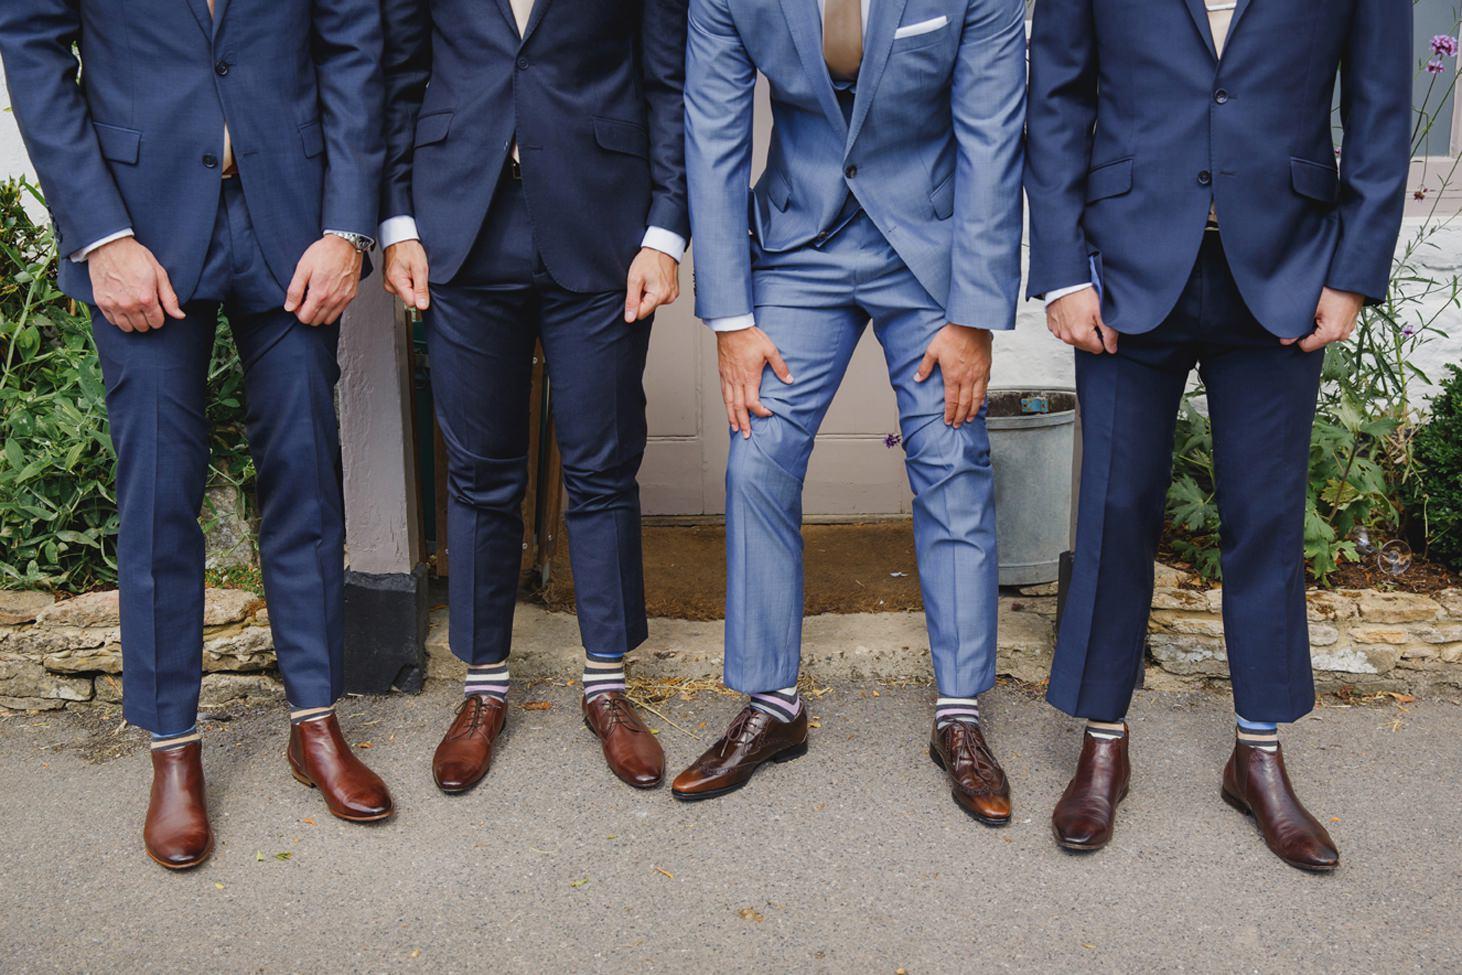 The Rectory Hotel wedding groomsmen's socks